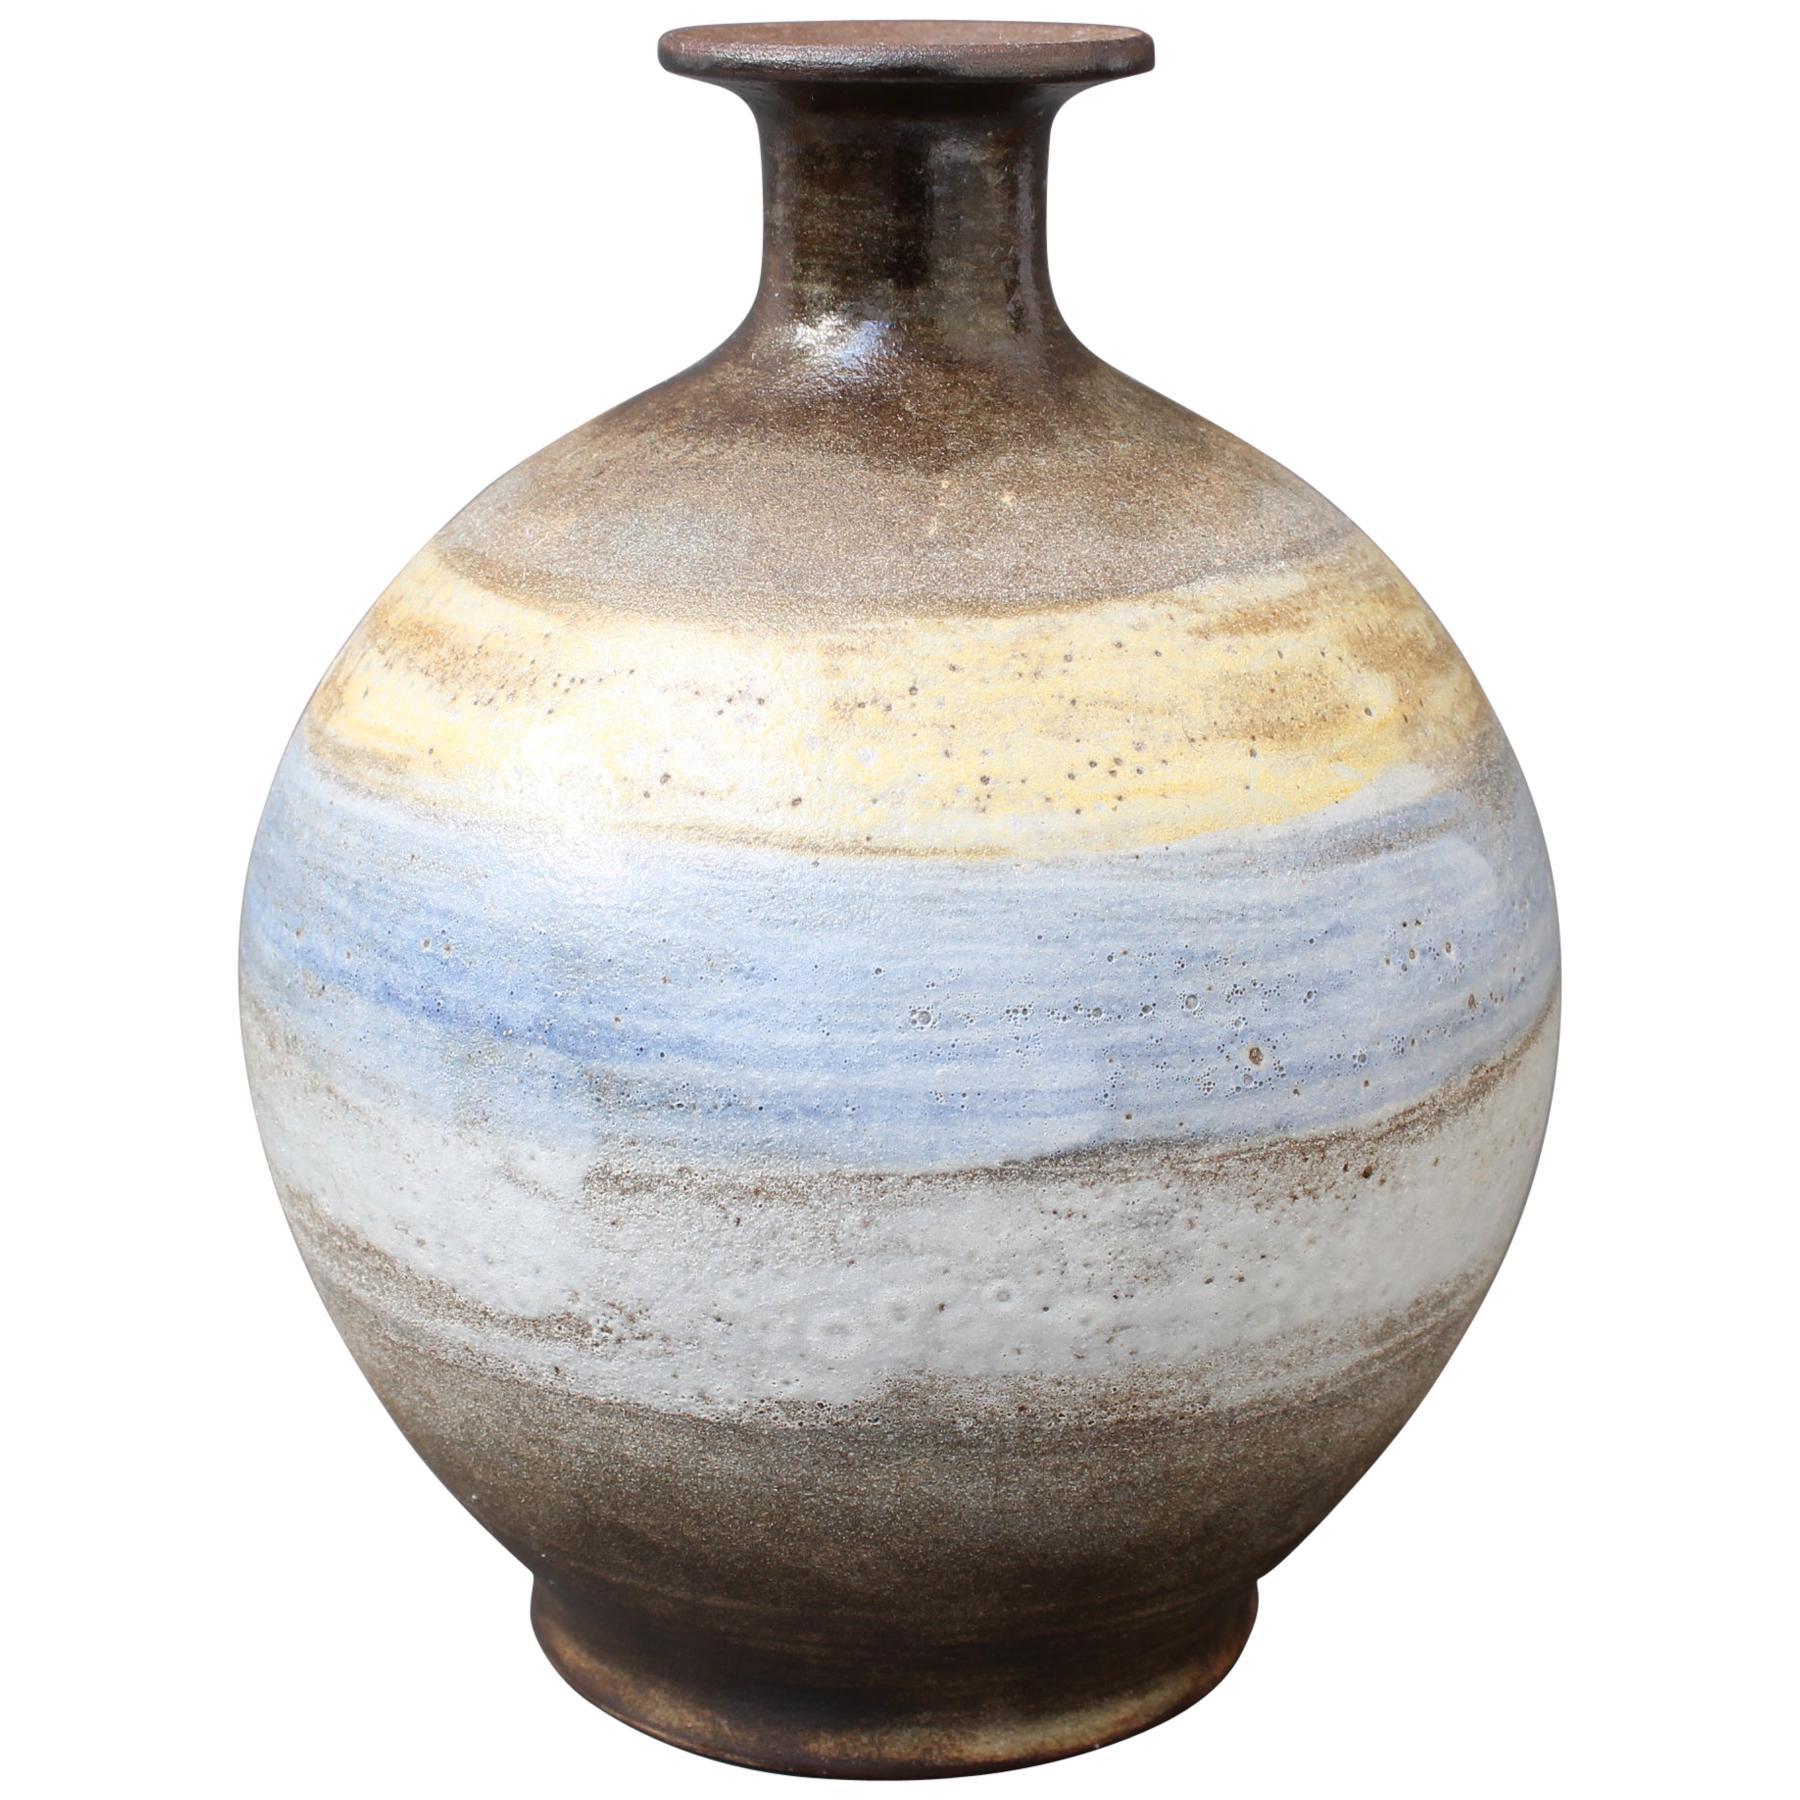 Midcentury French Ceramic Vase by Alexandre Kostanda, circa 1960s